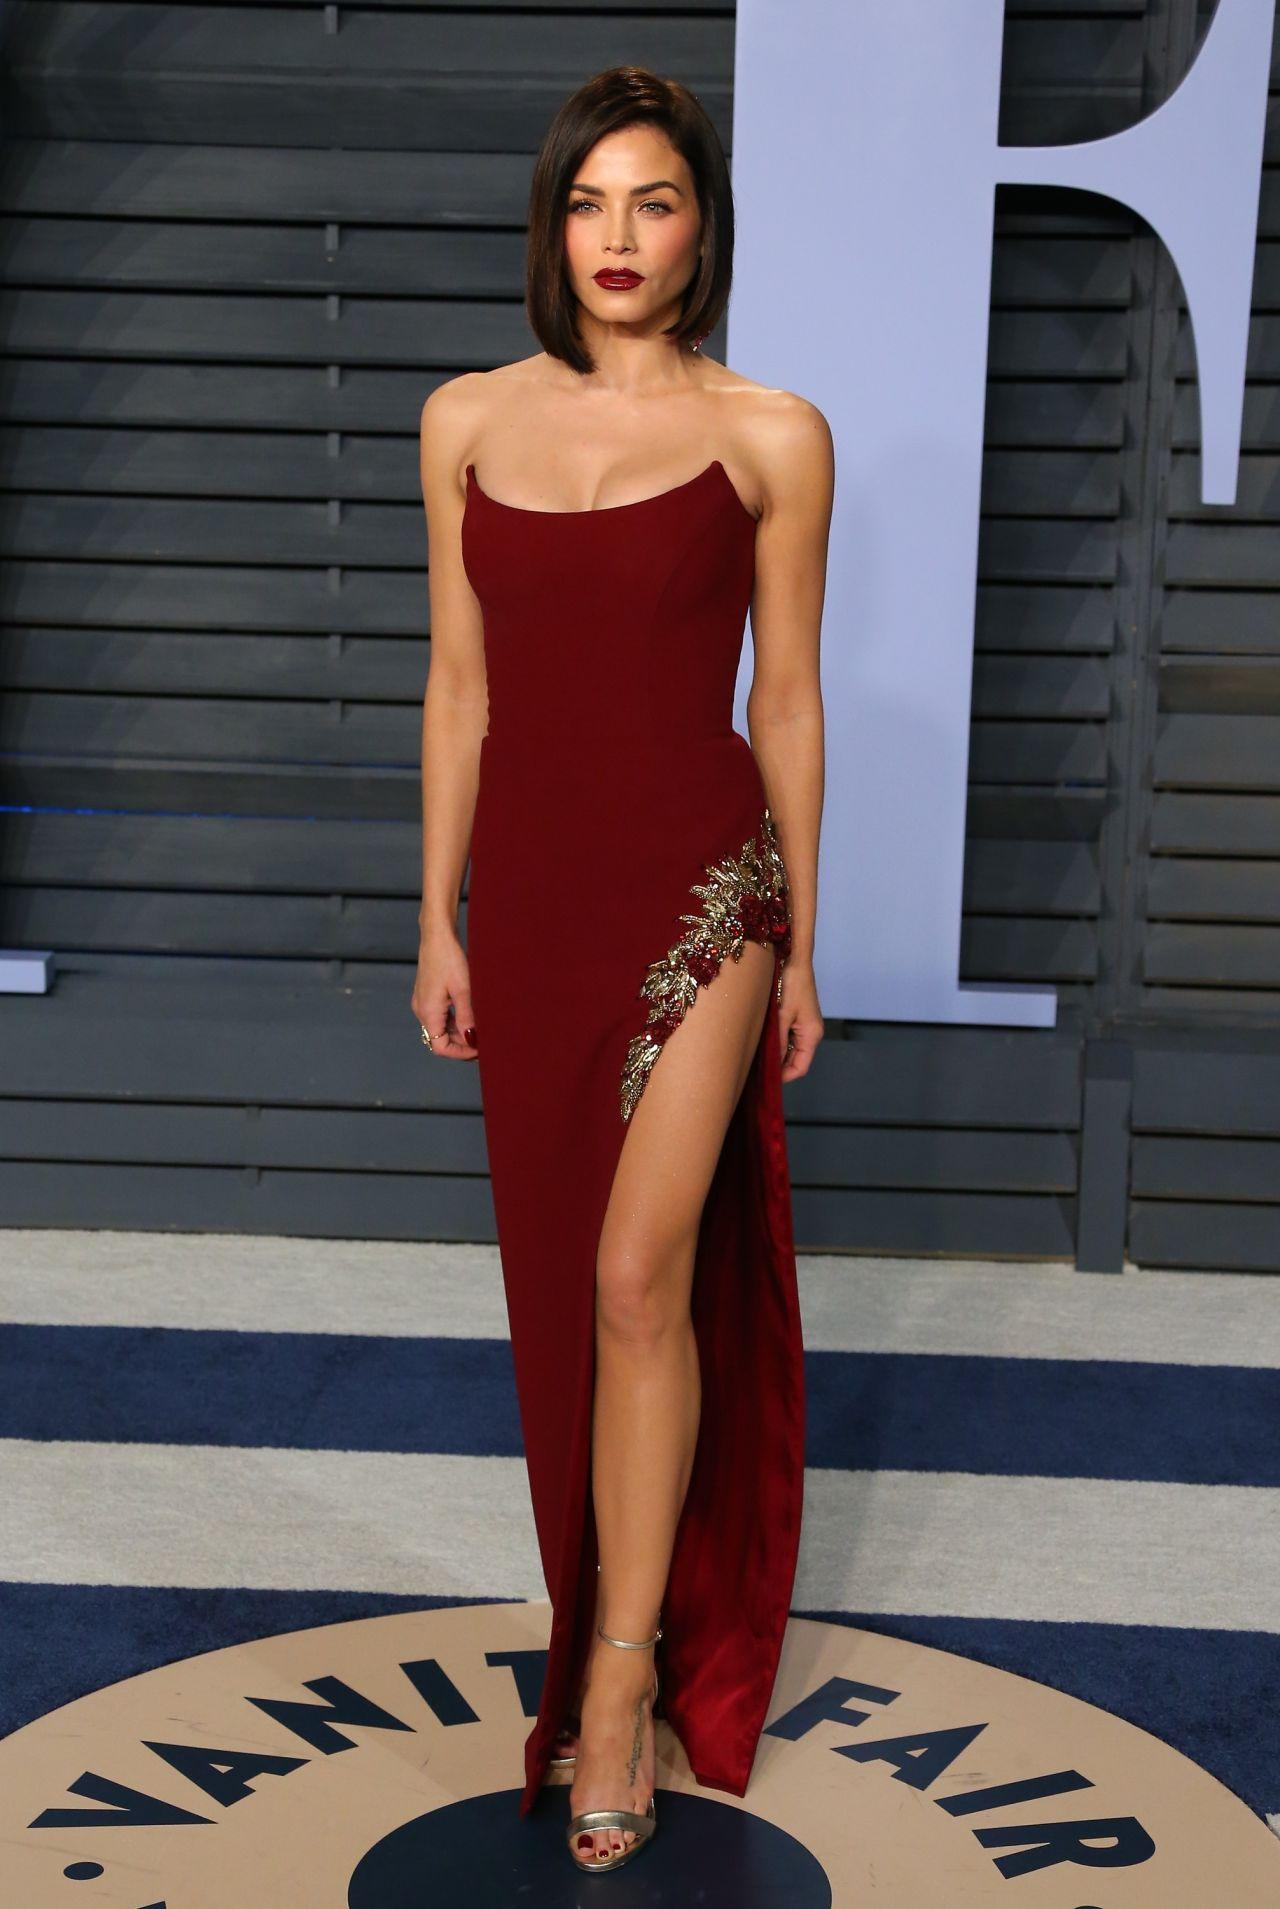 Jenna Dewan Tatum 2018 Vanity Fair Oscar Party In